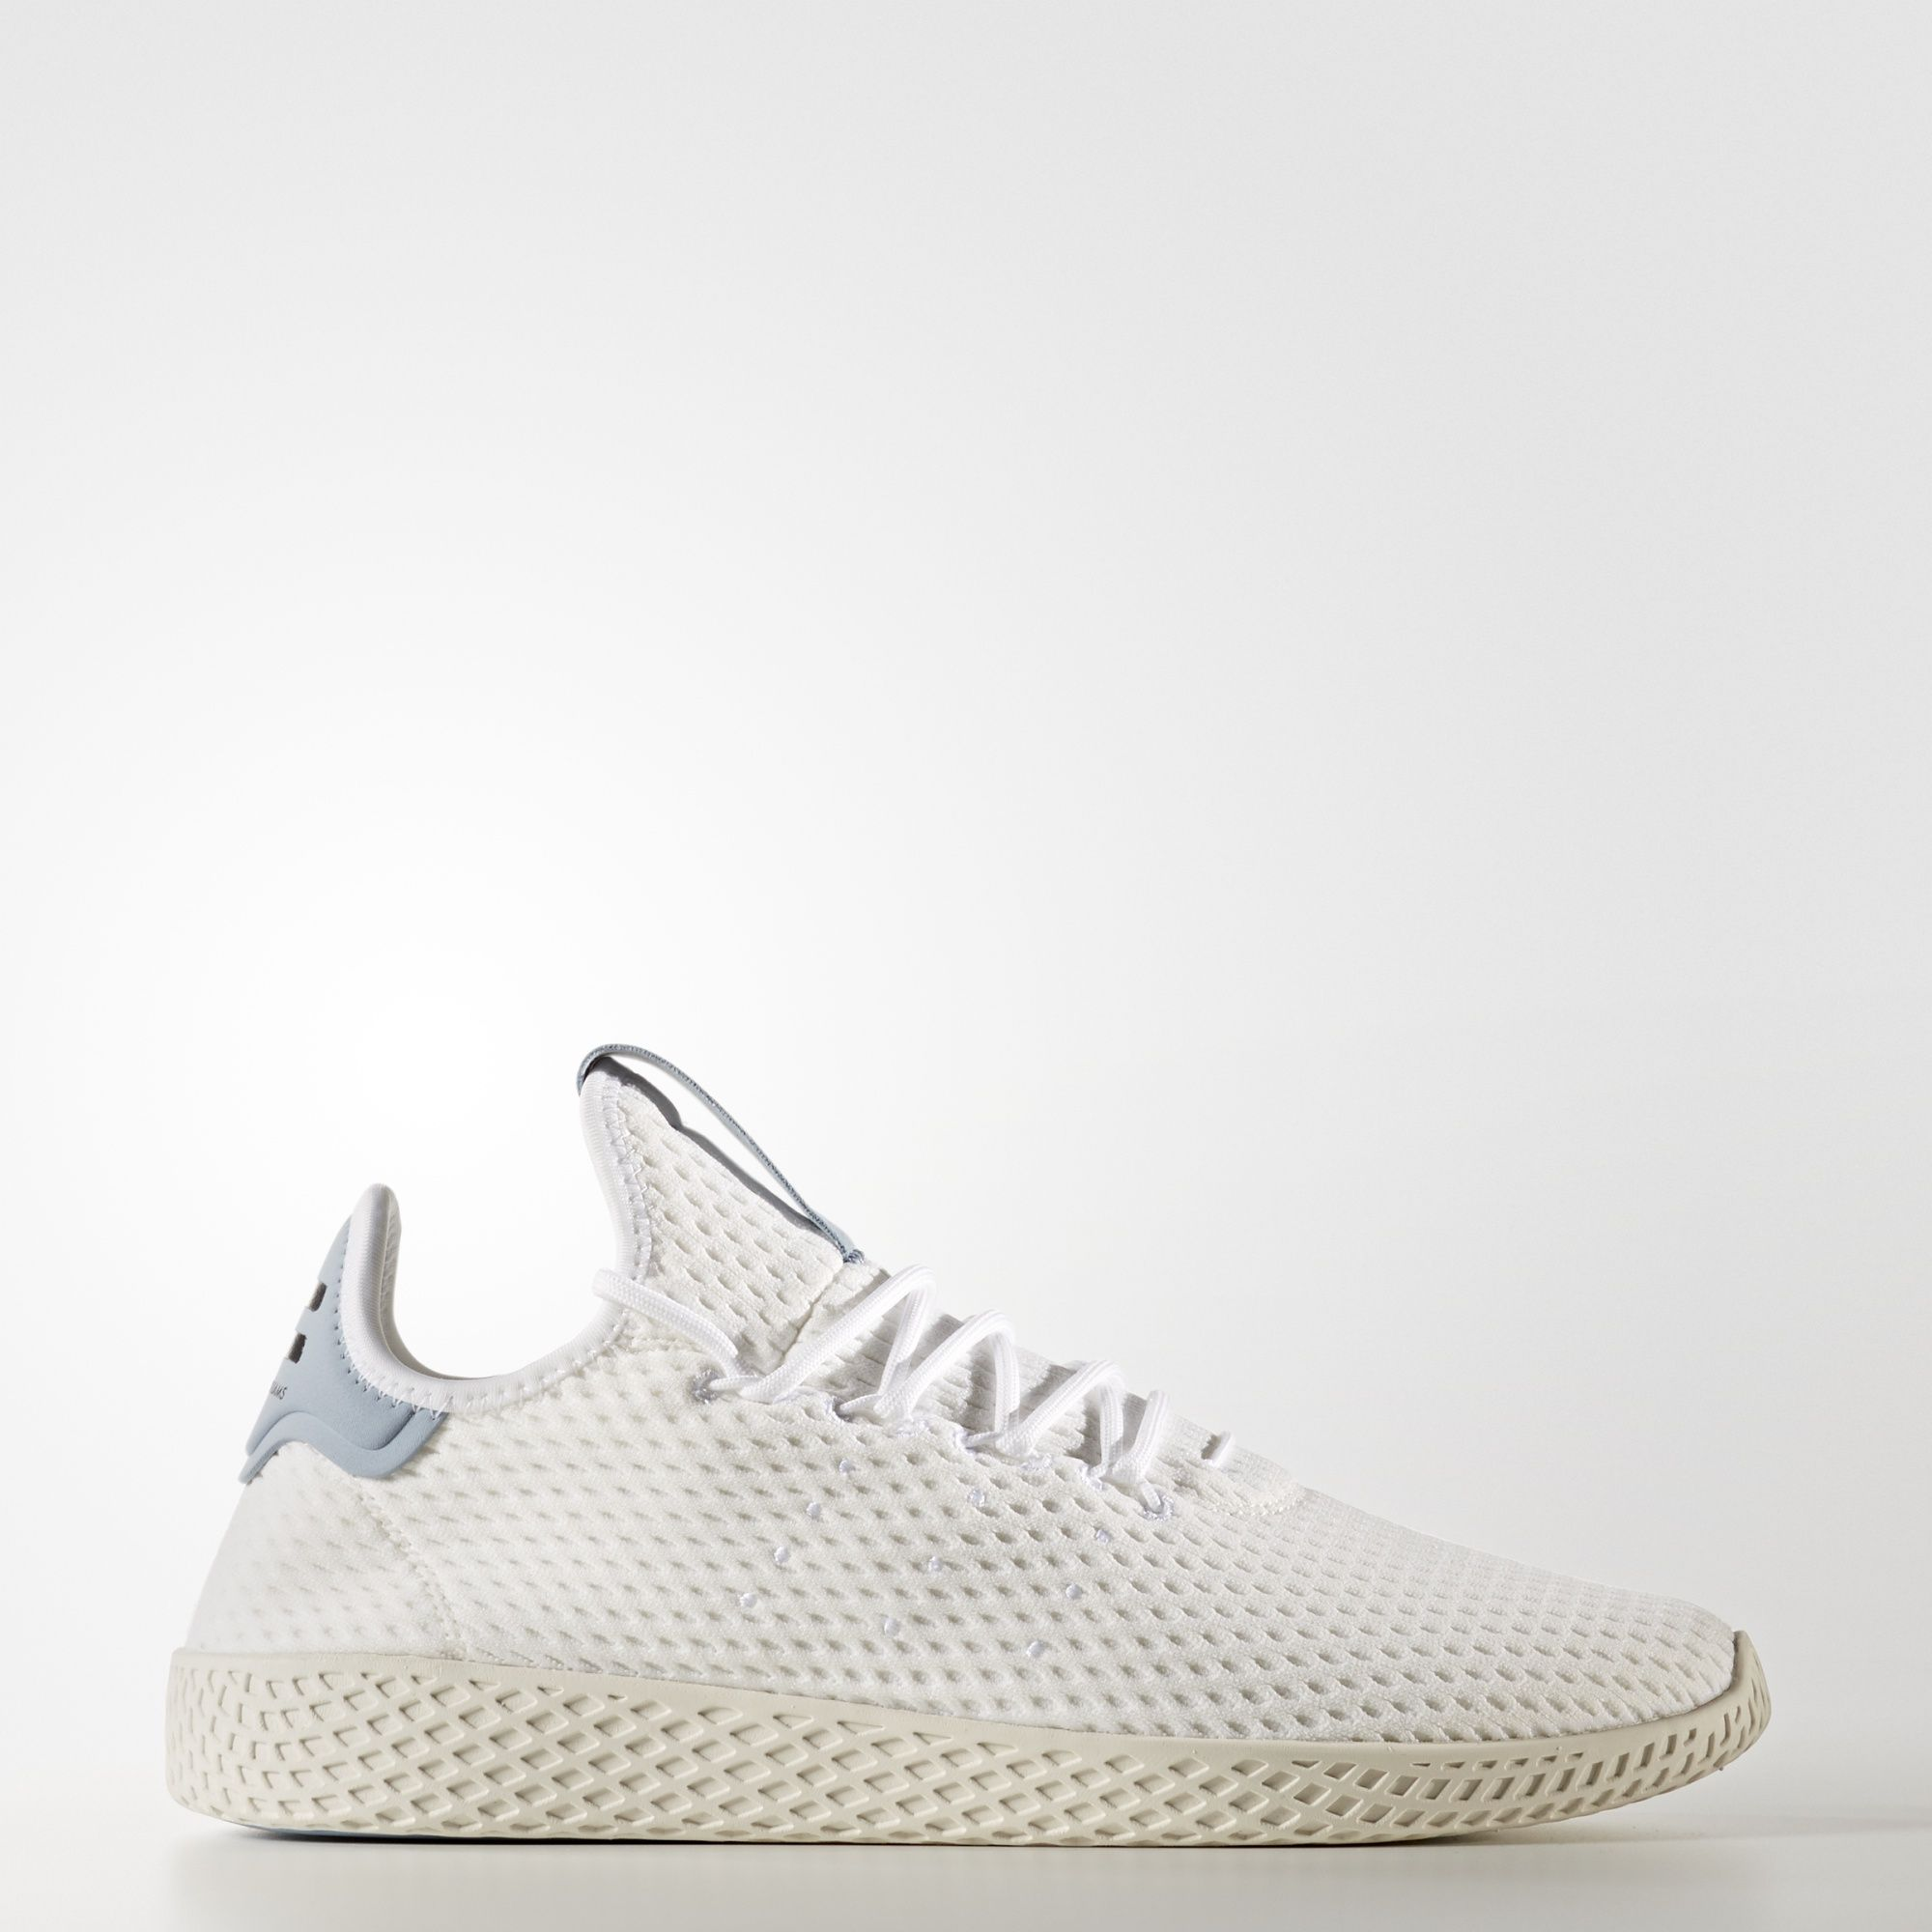 adidas Originals Pharrell Williams Tennis HU ftwwht realil